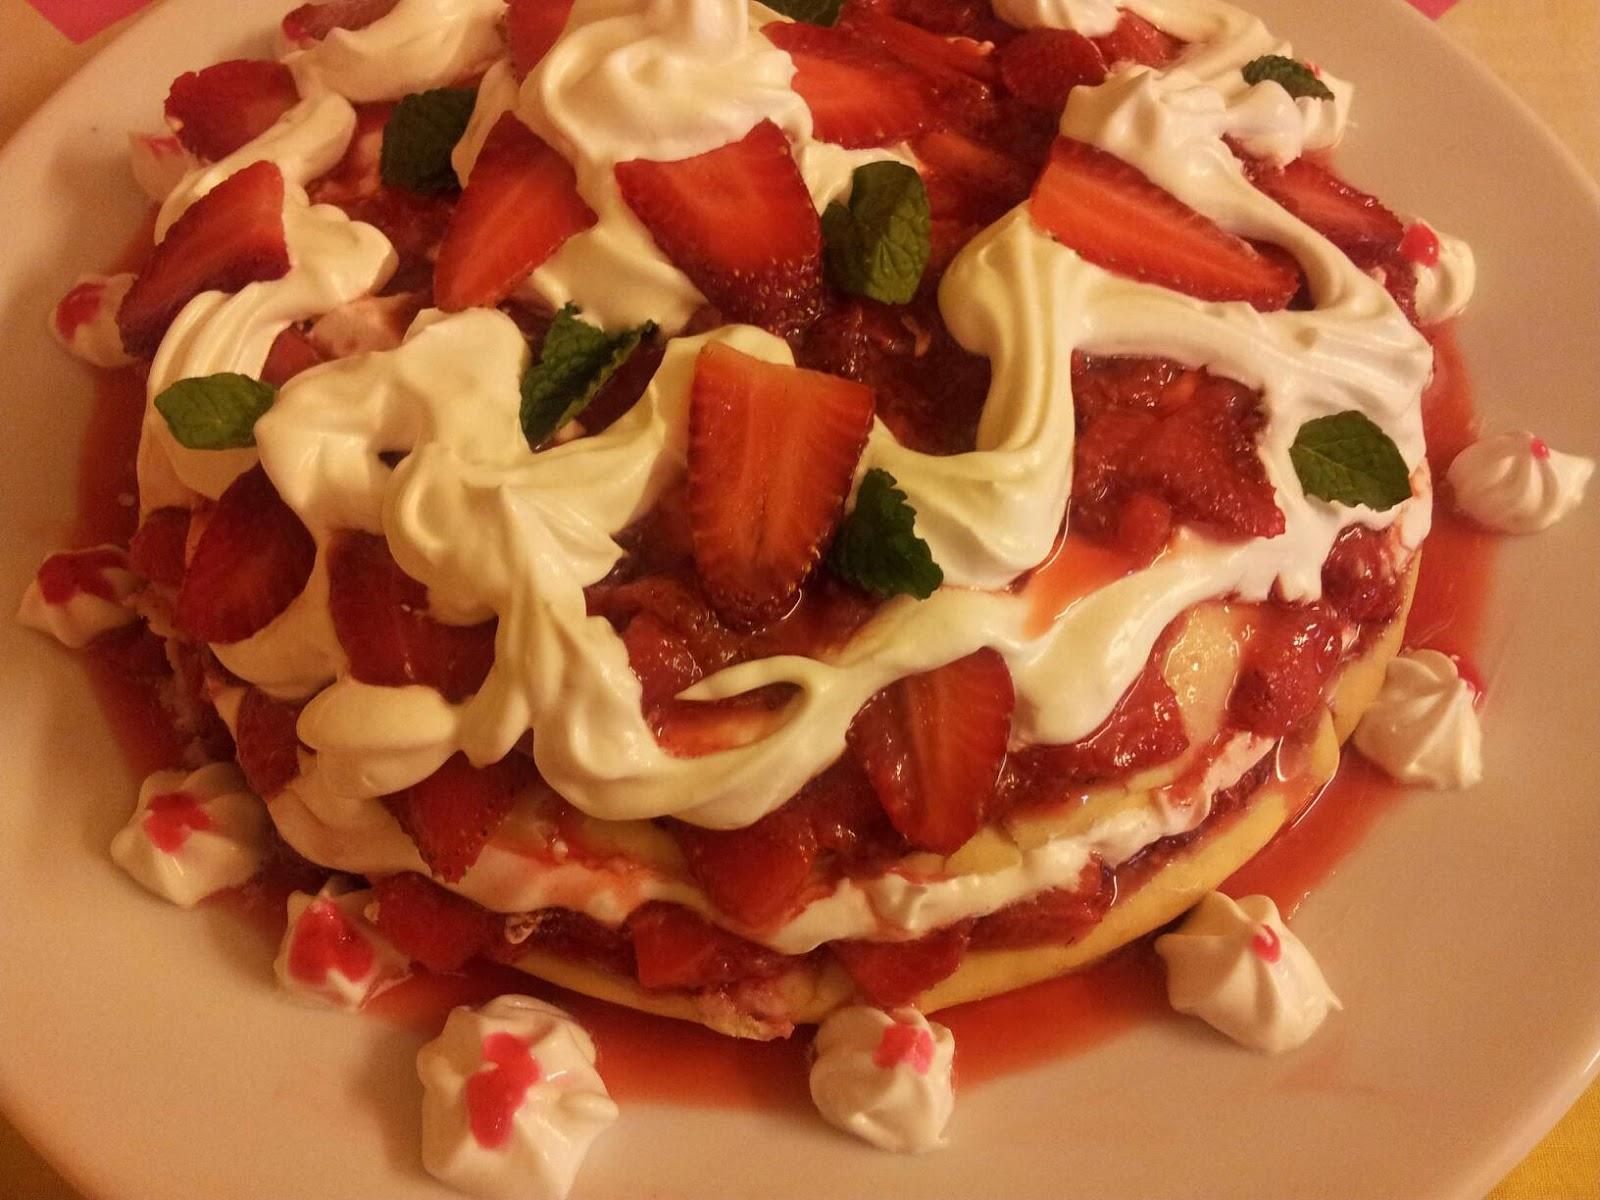 Pakistani kitchen strawberry shortcake for Atkins cuisine all purpose baking mix where to buy